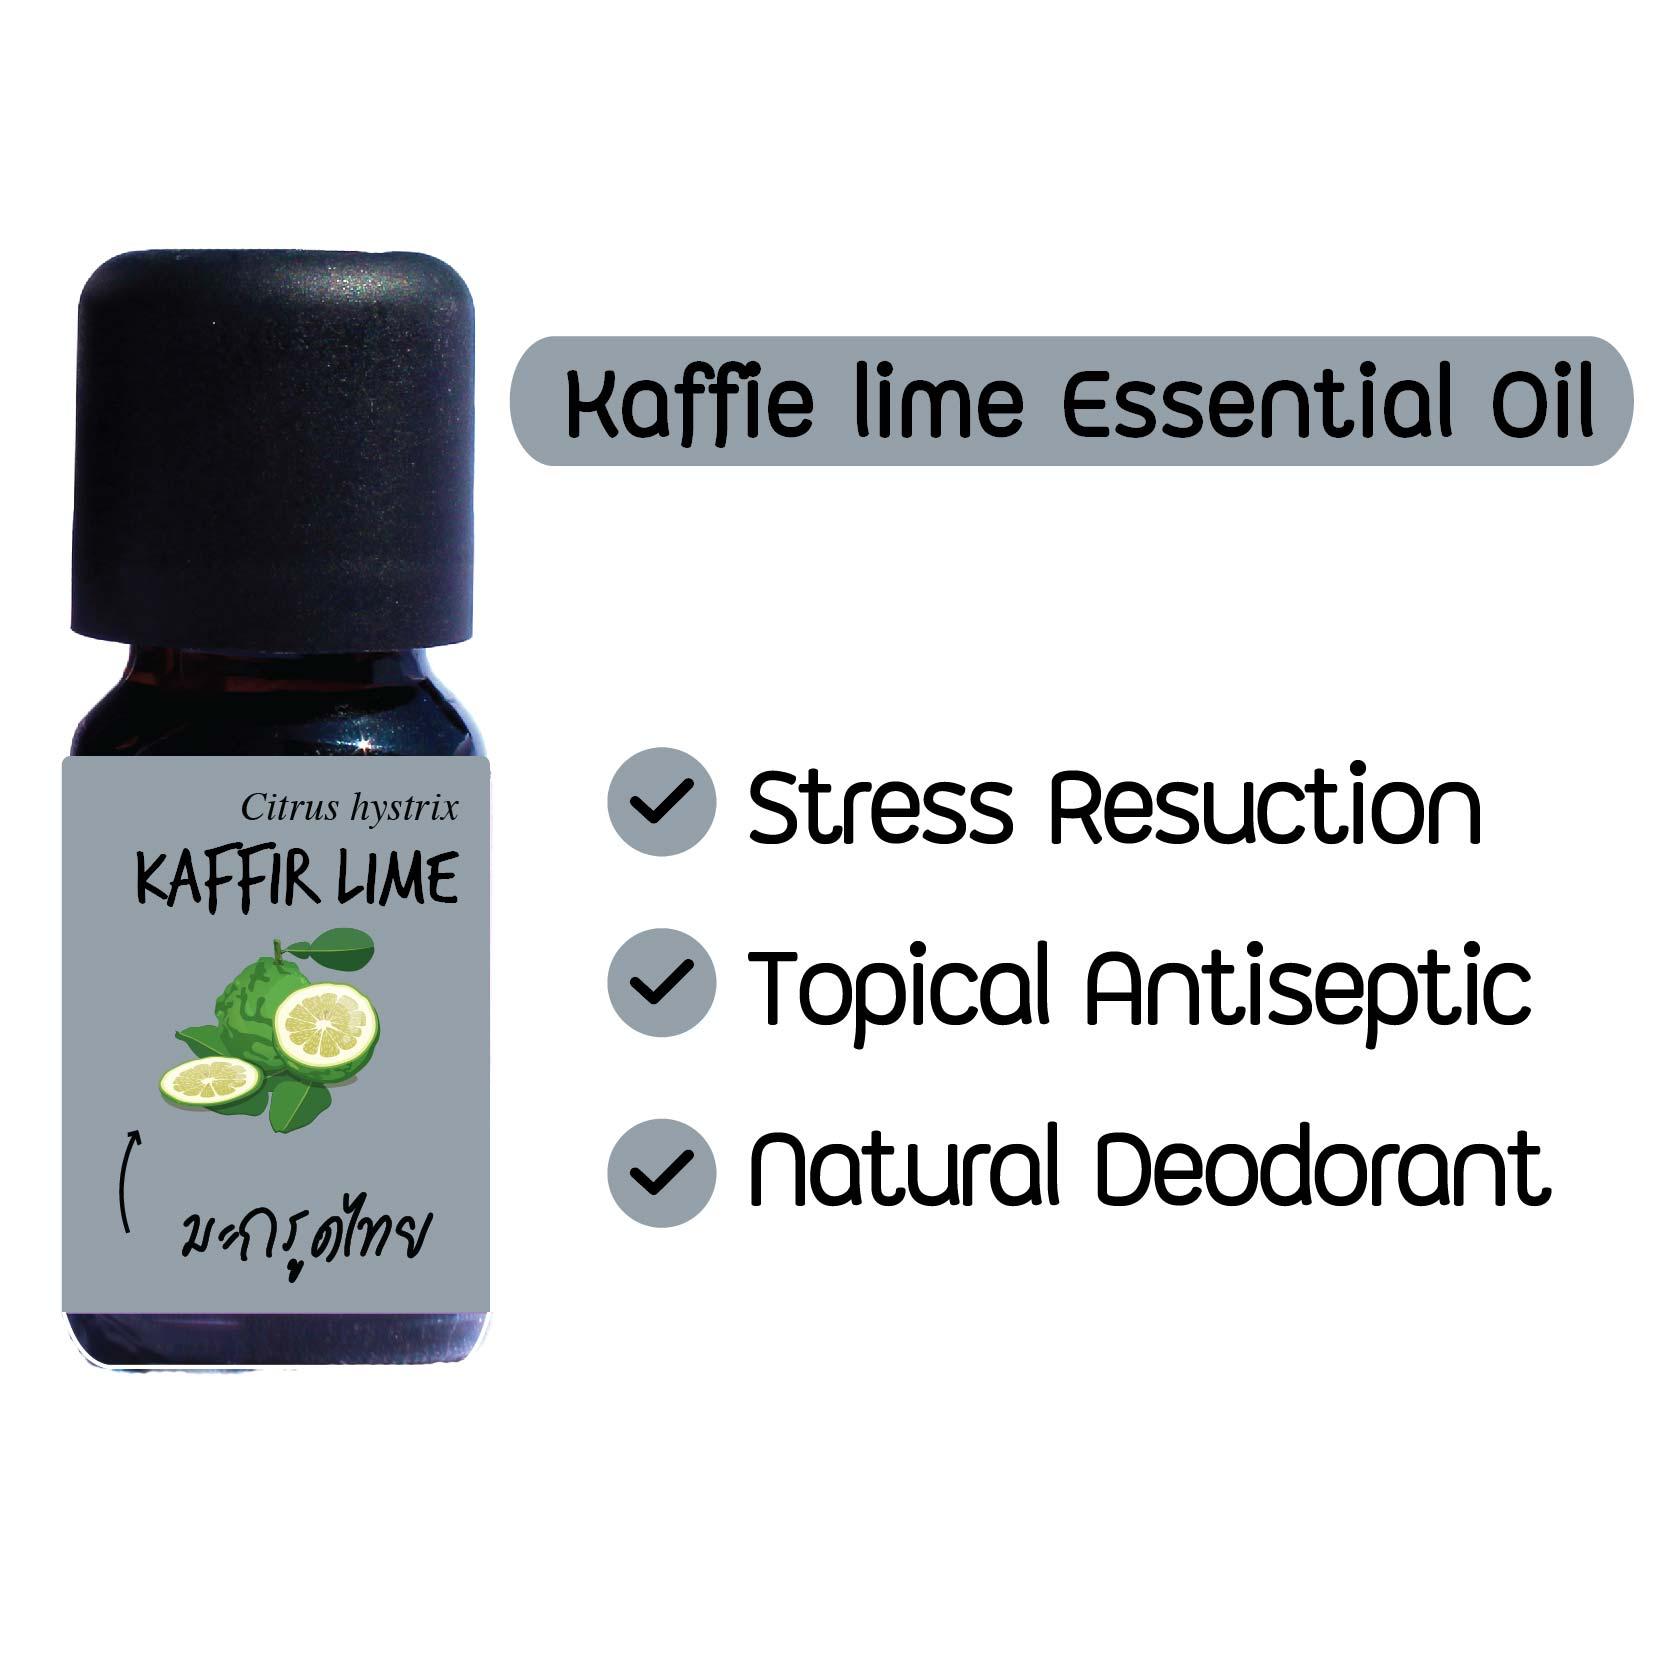 Elyrest Kaffir Lime Essential Oil